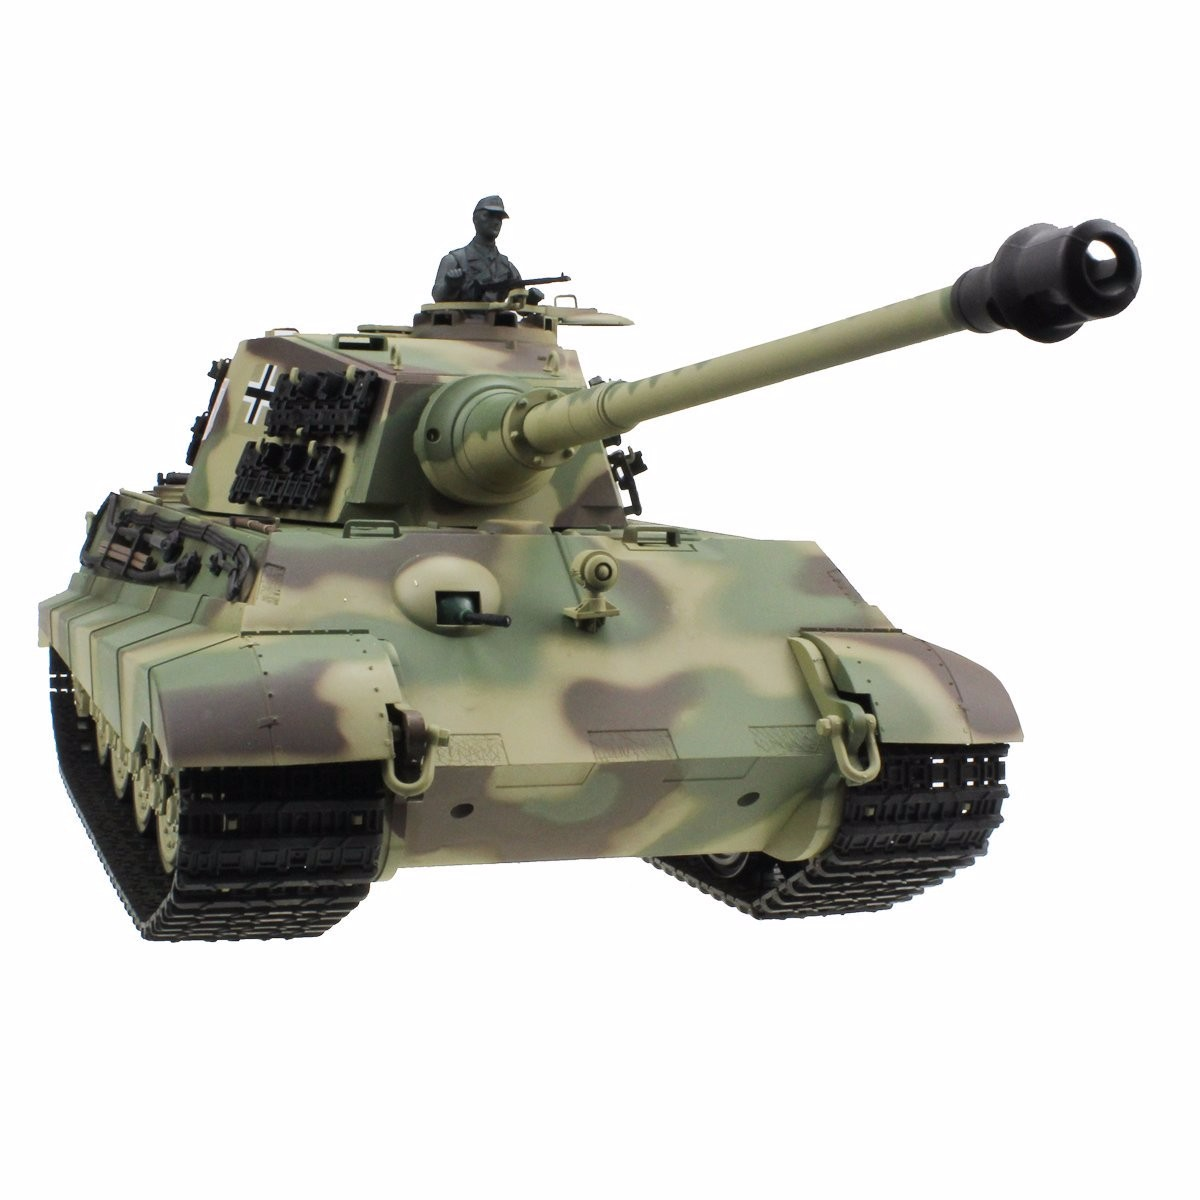 2.4Ghz Radio Control 1 16 King Tiger (Henschel Turret) Air Soft RC Battle Tank w Sound & Smoke RC RTR by